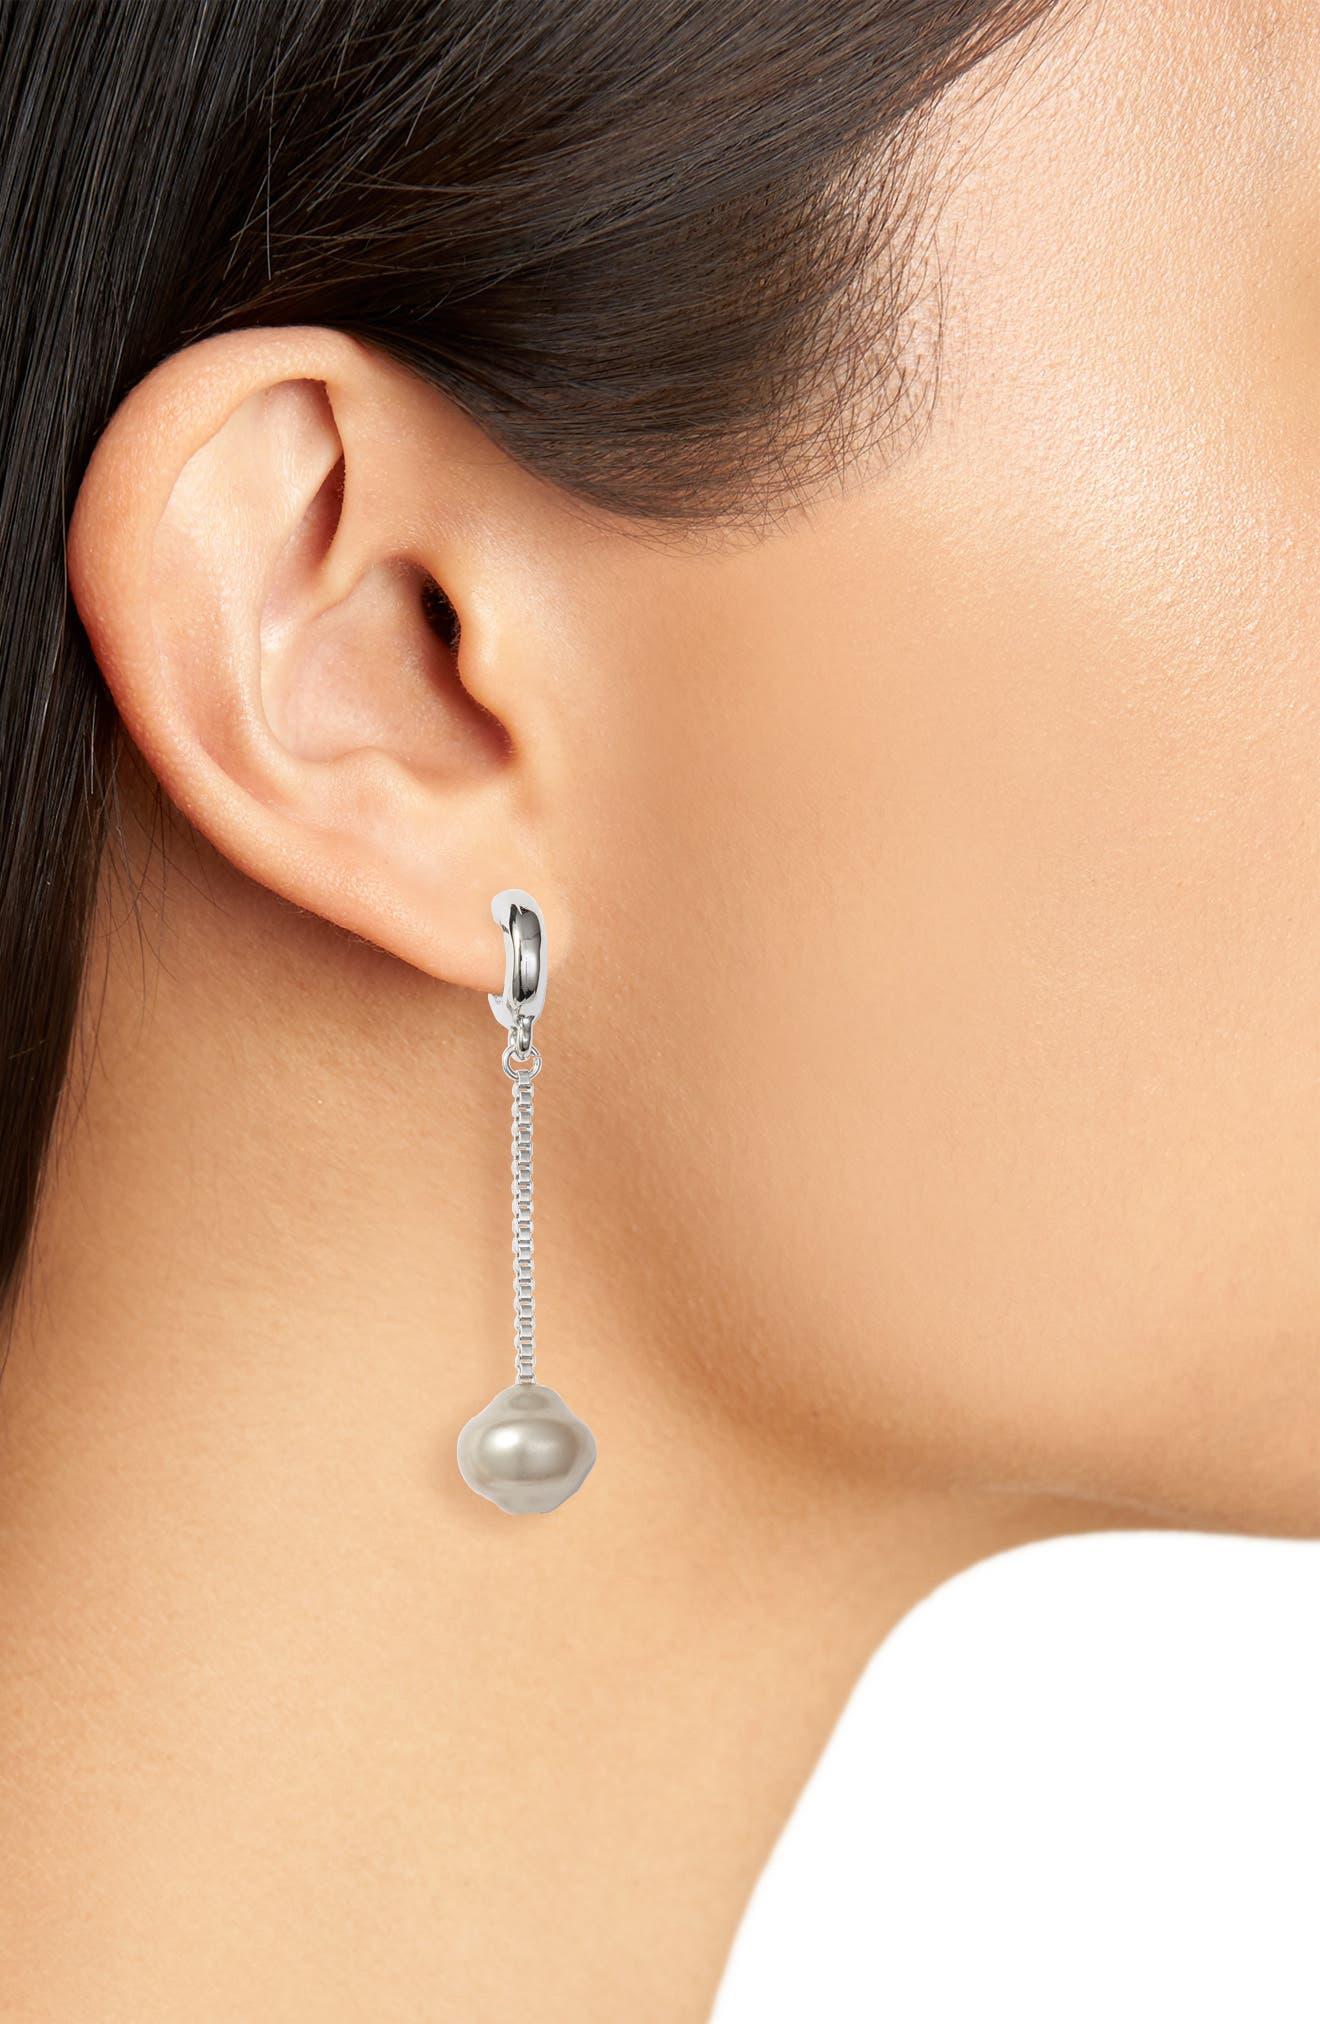 Linear Orb Drop Earrings,                             Alternate thumbnail 3, color,                             GREY- RHODIUM